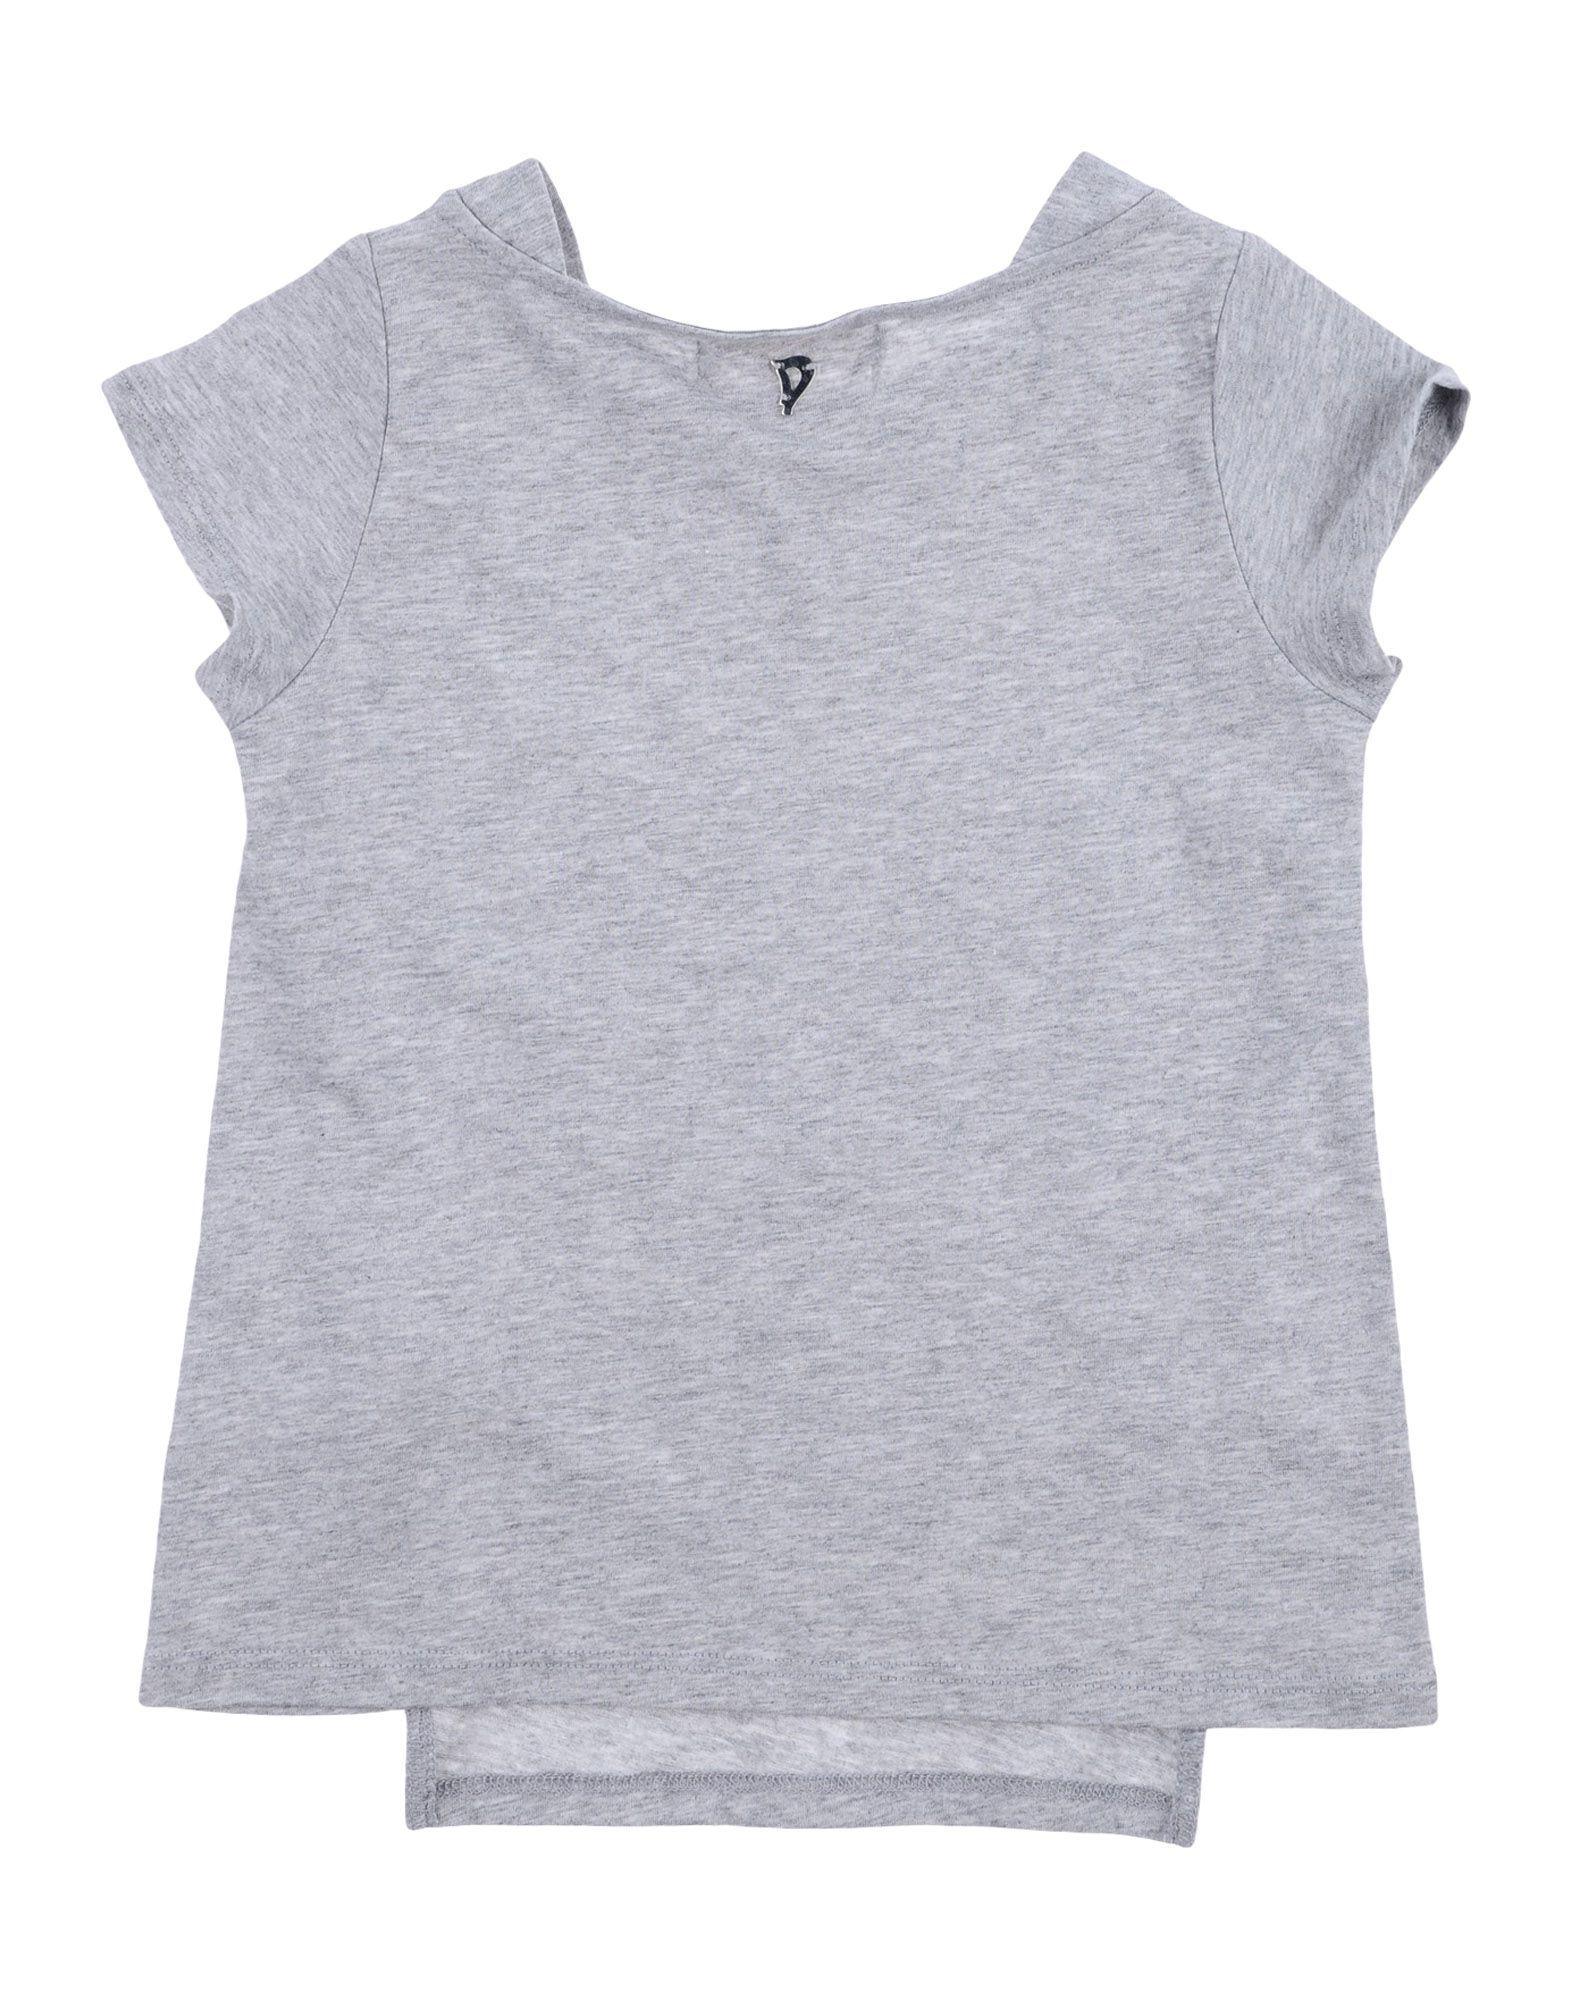 TOPWEAR Dondup Light grey Girl Cotton